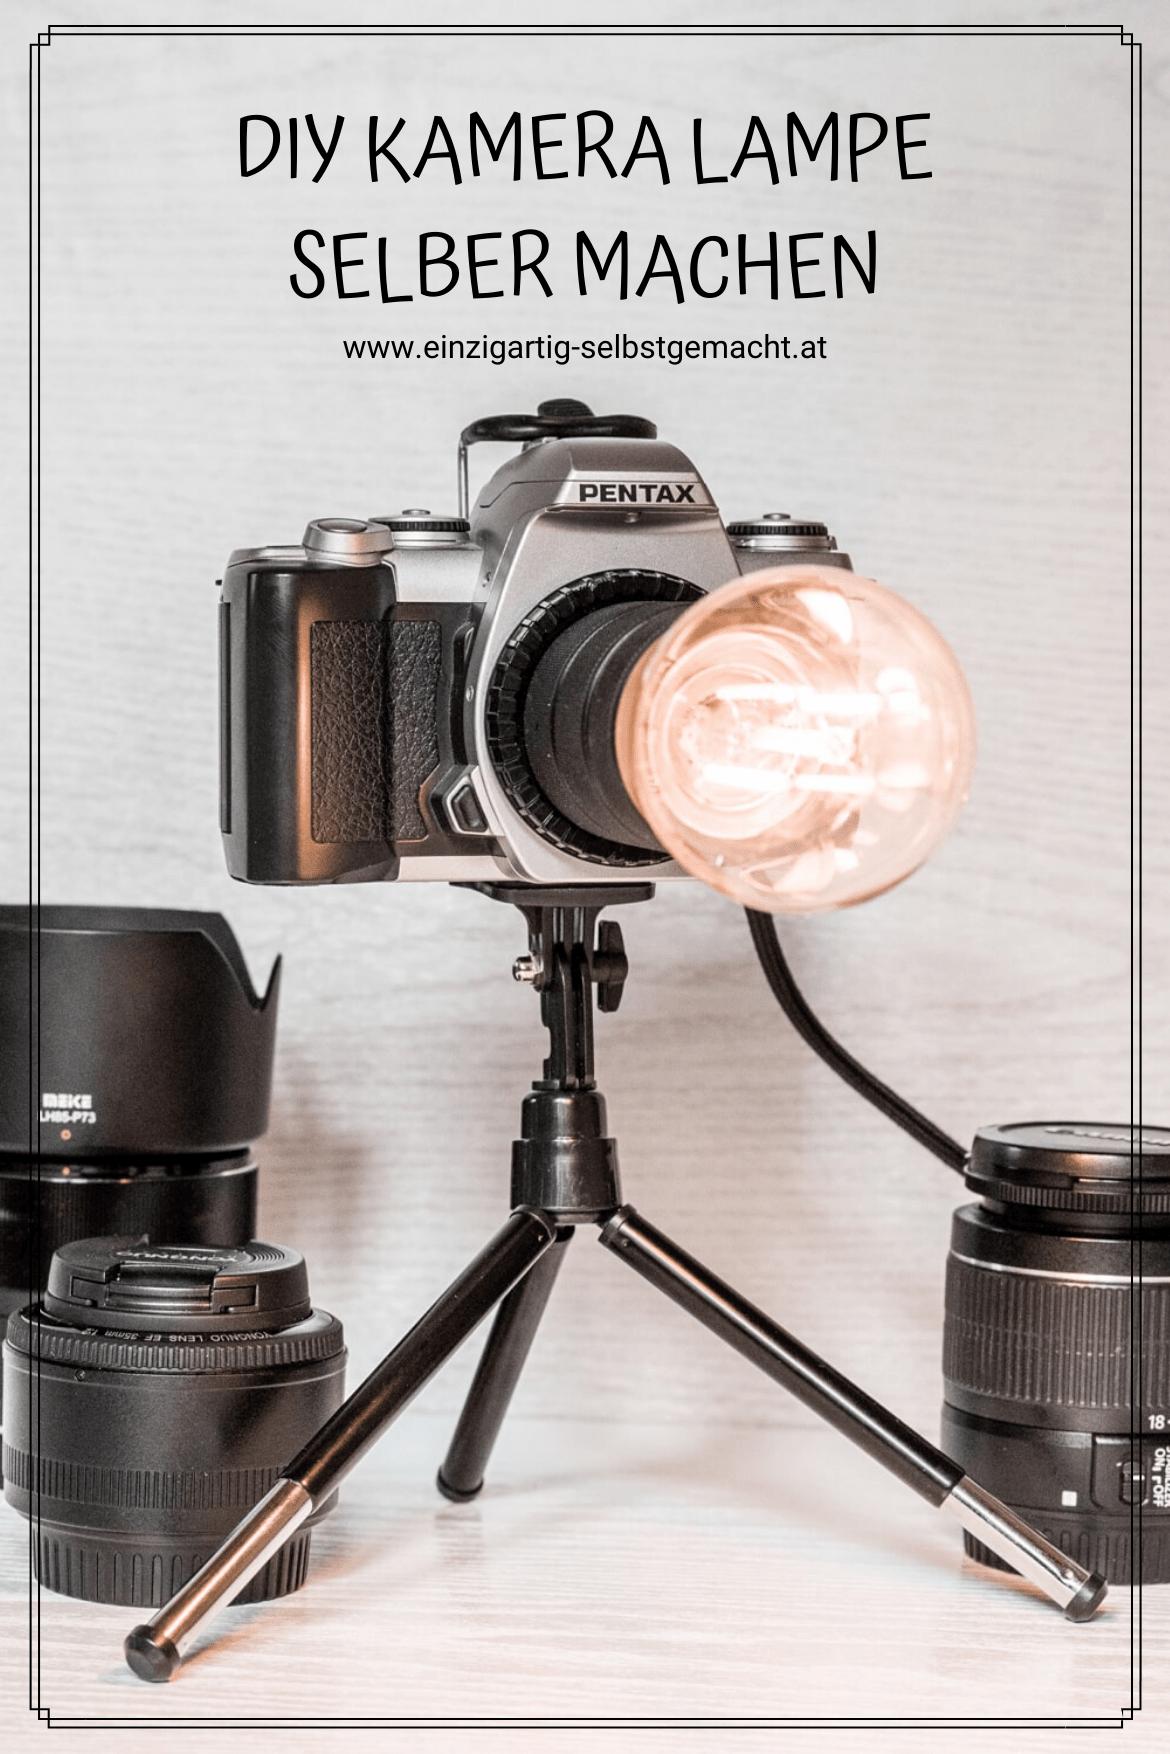 diy-kamera-lampe-pinterest